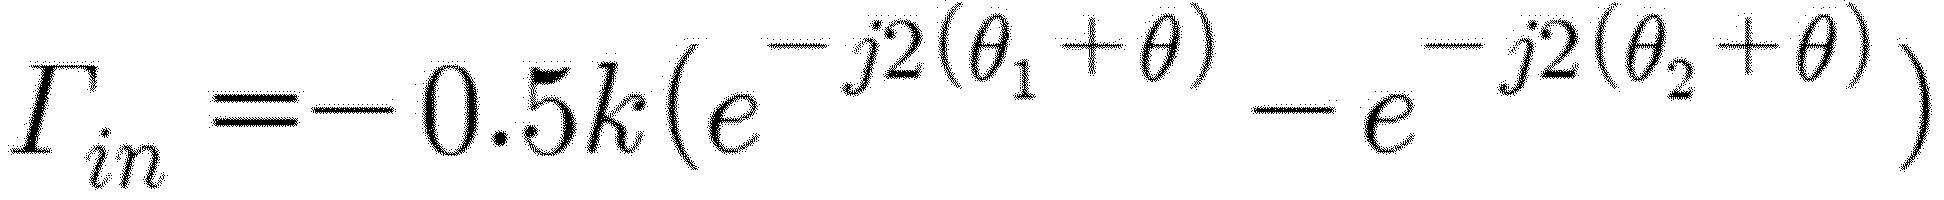 Figure PCTKR2016012769-appb-I000002